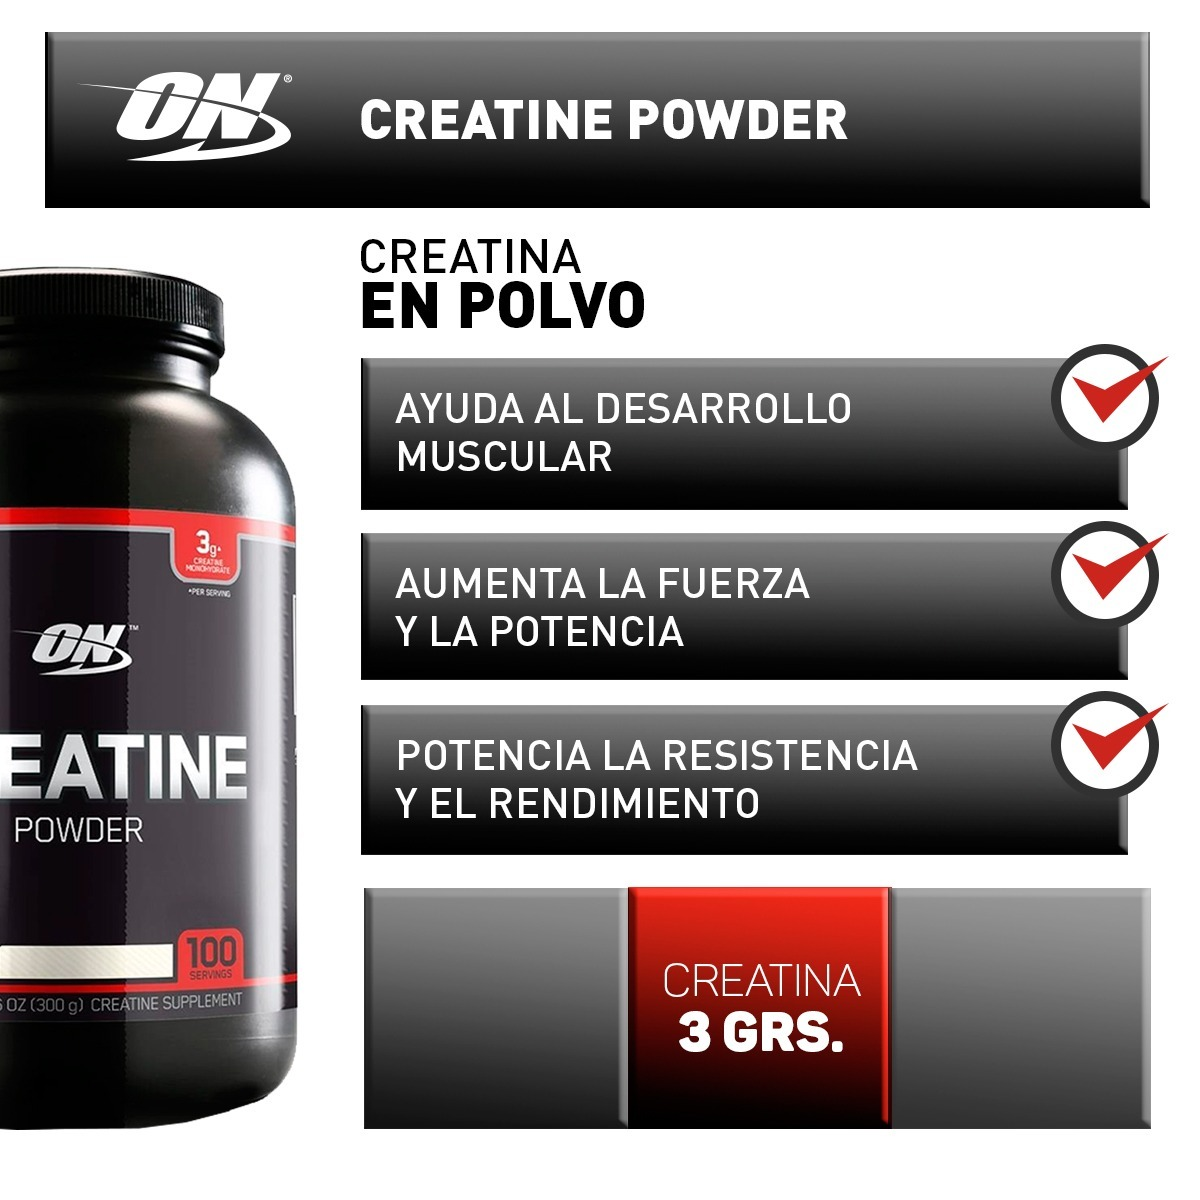 Creatina Black 300gr Optimum Nutrition X 2 Unidades - $ 2.328,00 ...